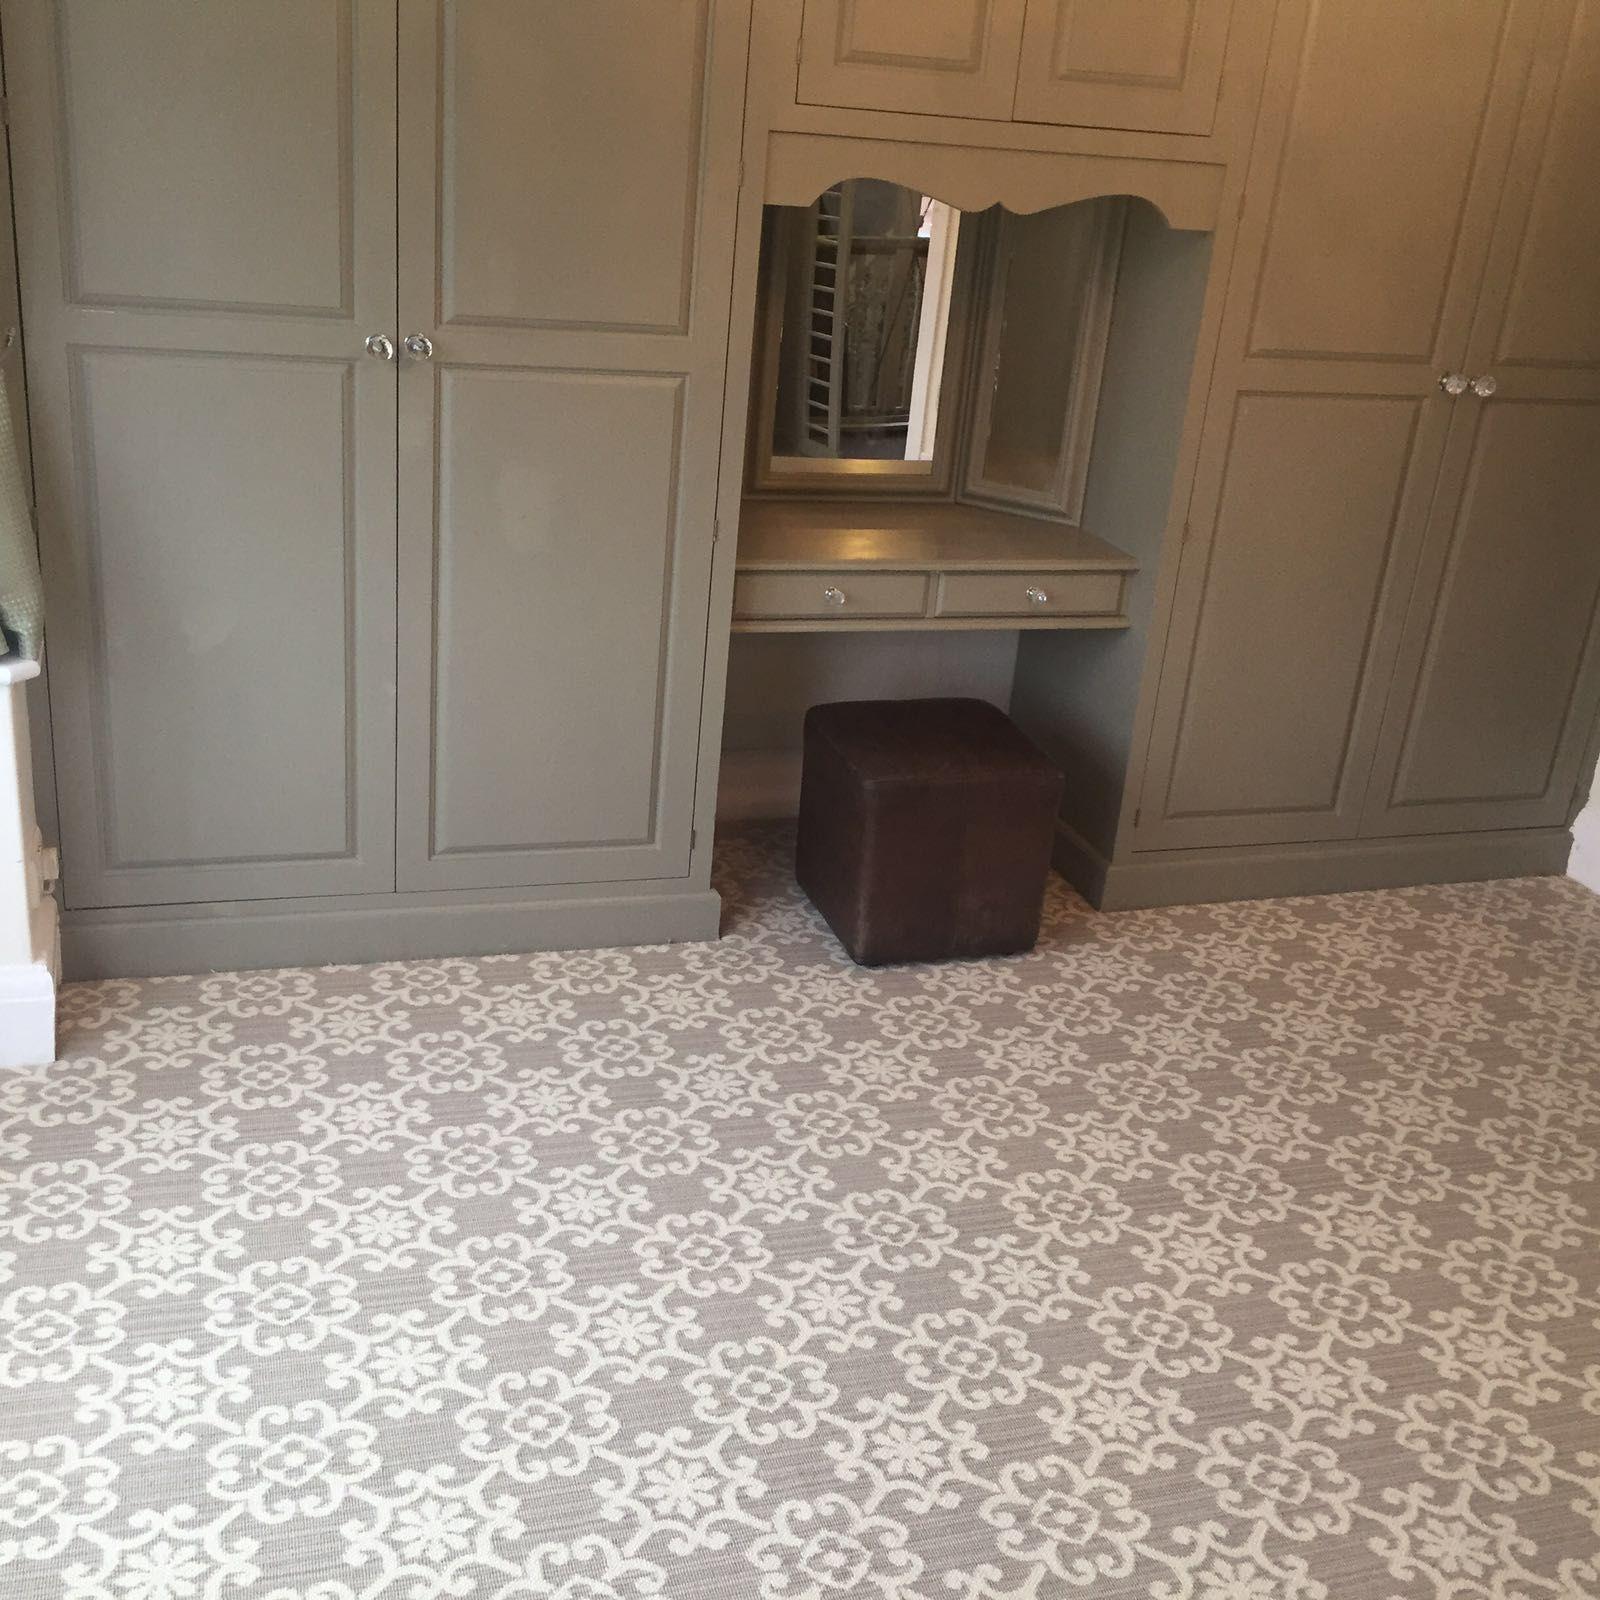 Axminster Carpets Royal Borough Decorative Chelsea